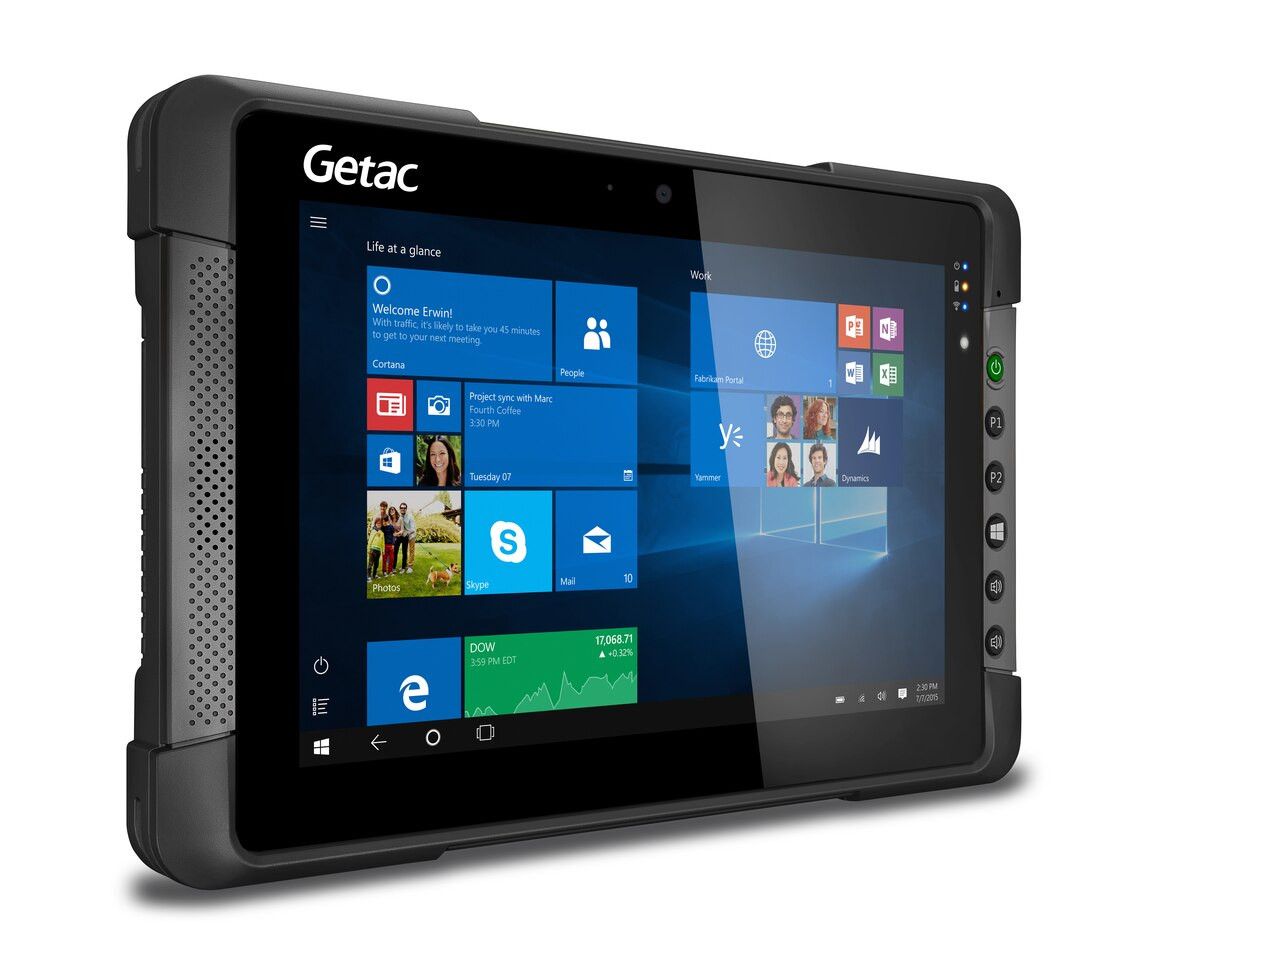 "Getac T800 G2 Basic USA,Intel Atom Processor x7-Z8750,8.1""+Webcam,Microsoft Windows 10 Pro x64 with 4GB RAM ,64GB eMMC,Sunlight Readable (LCD+Touchscreen),US Power cord,8M Rear Camera,Wifi+BT,RJ45,TPM 2.0"